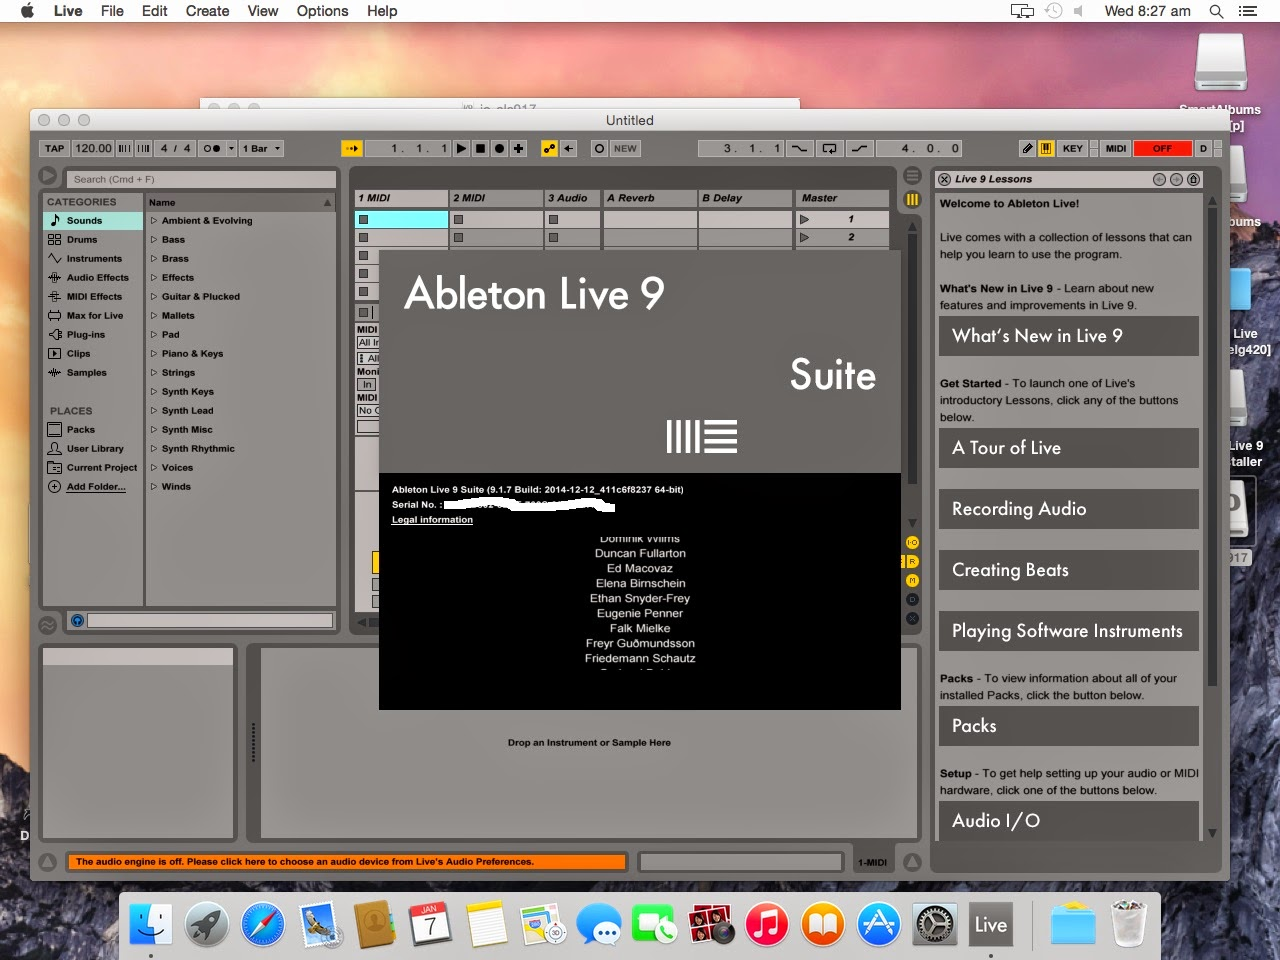 Ableton Live 10.1 Crack With Keygen Latest Version 12222 [Win+Mac]